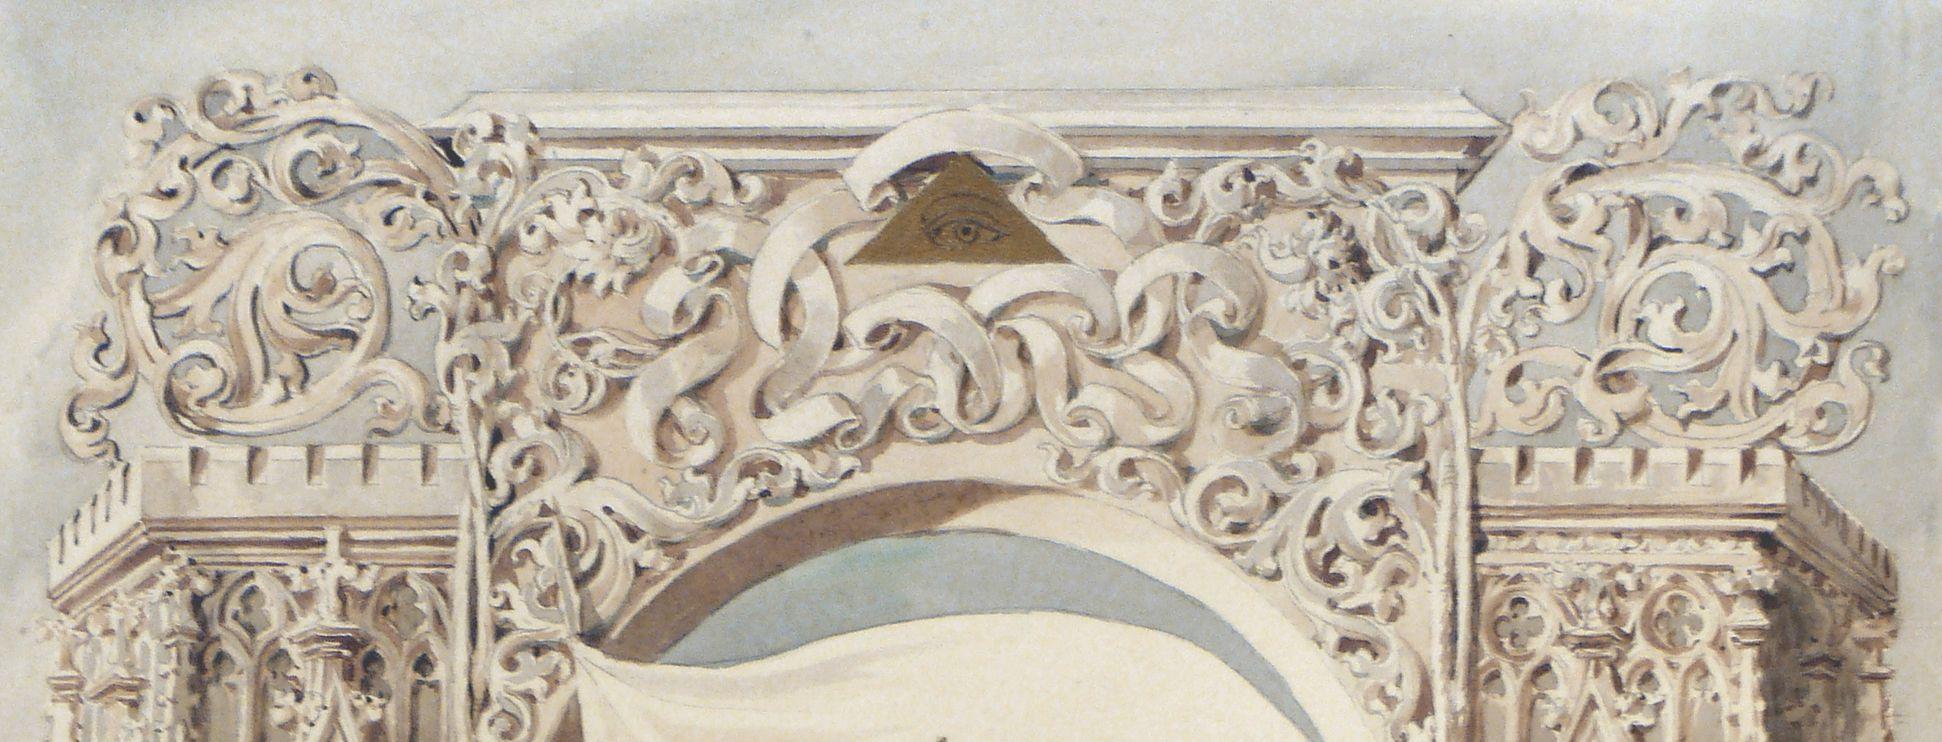 Landsberg Schloss, Titelblatt Detail